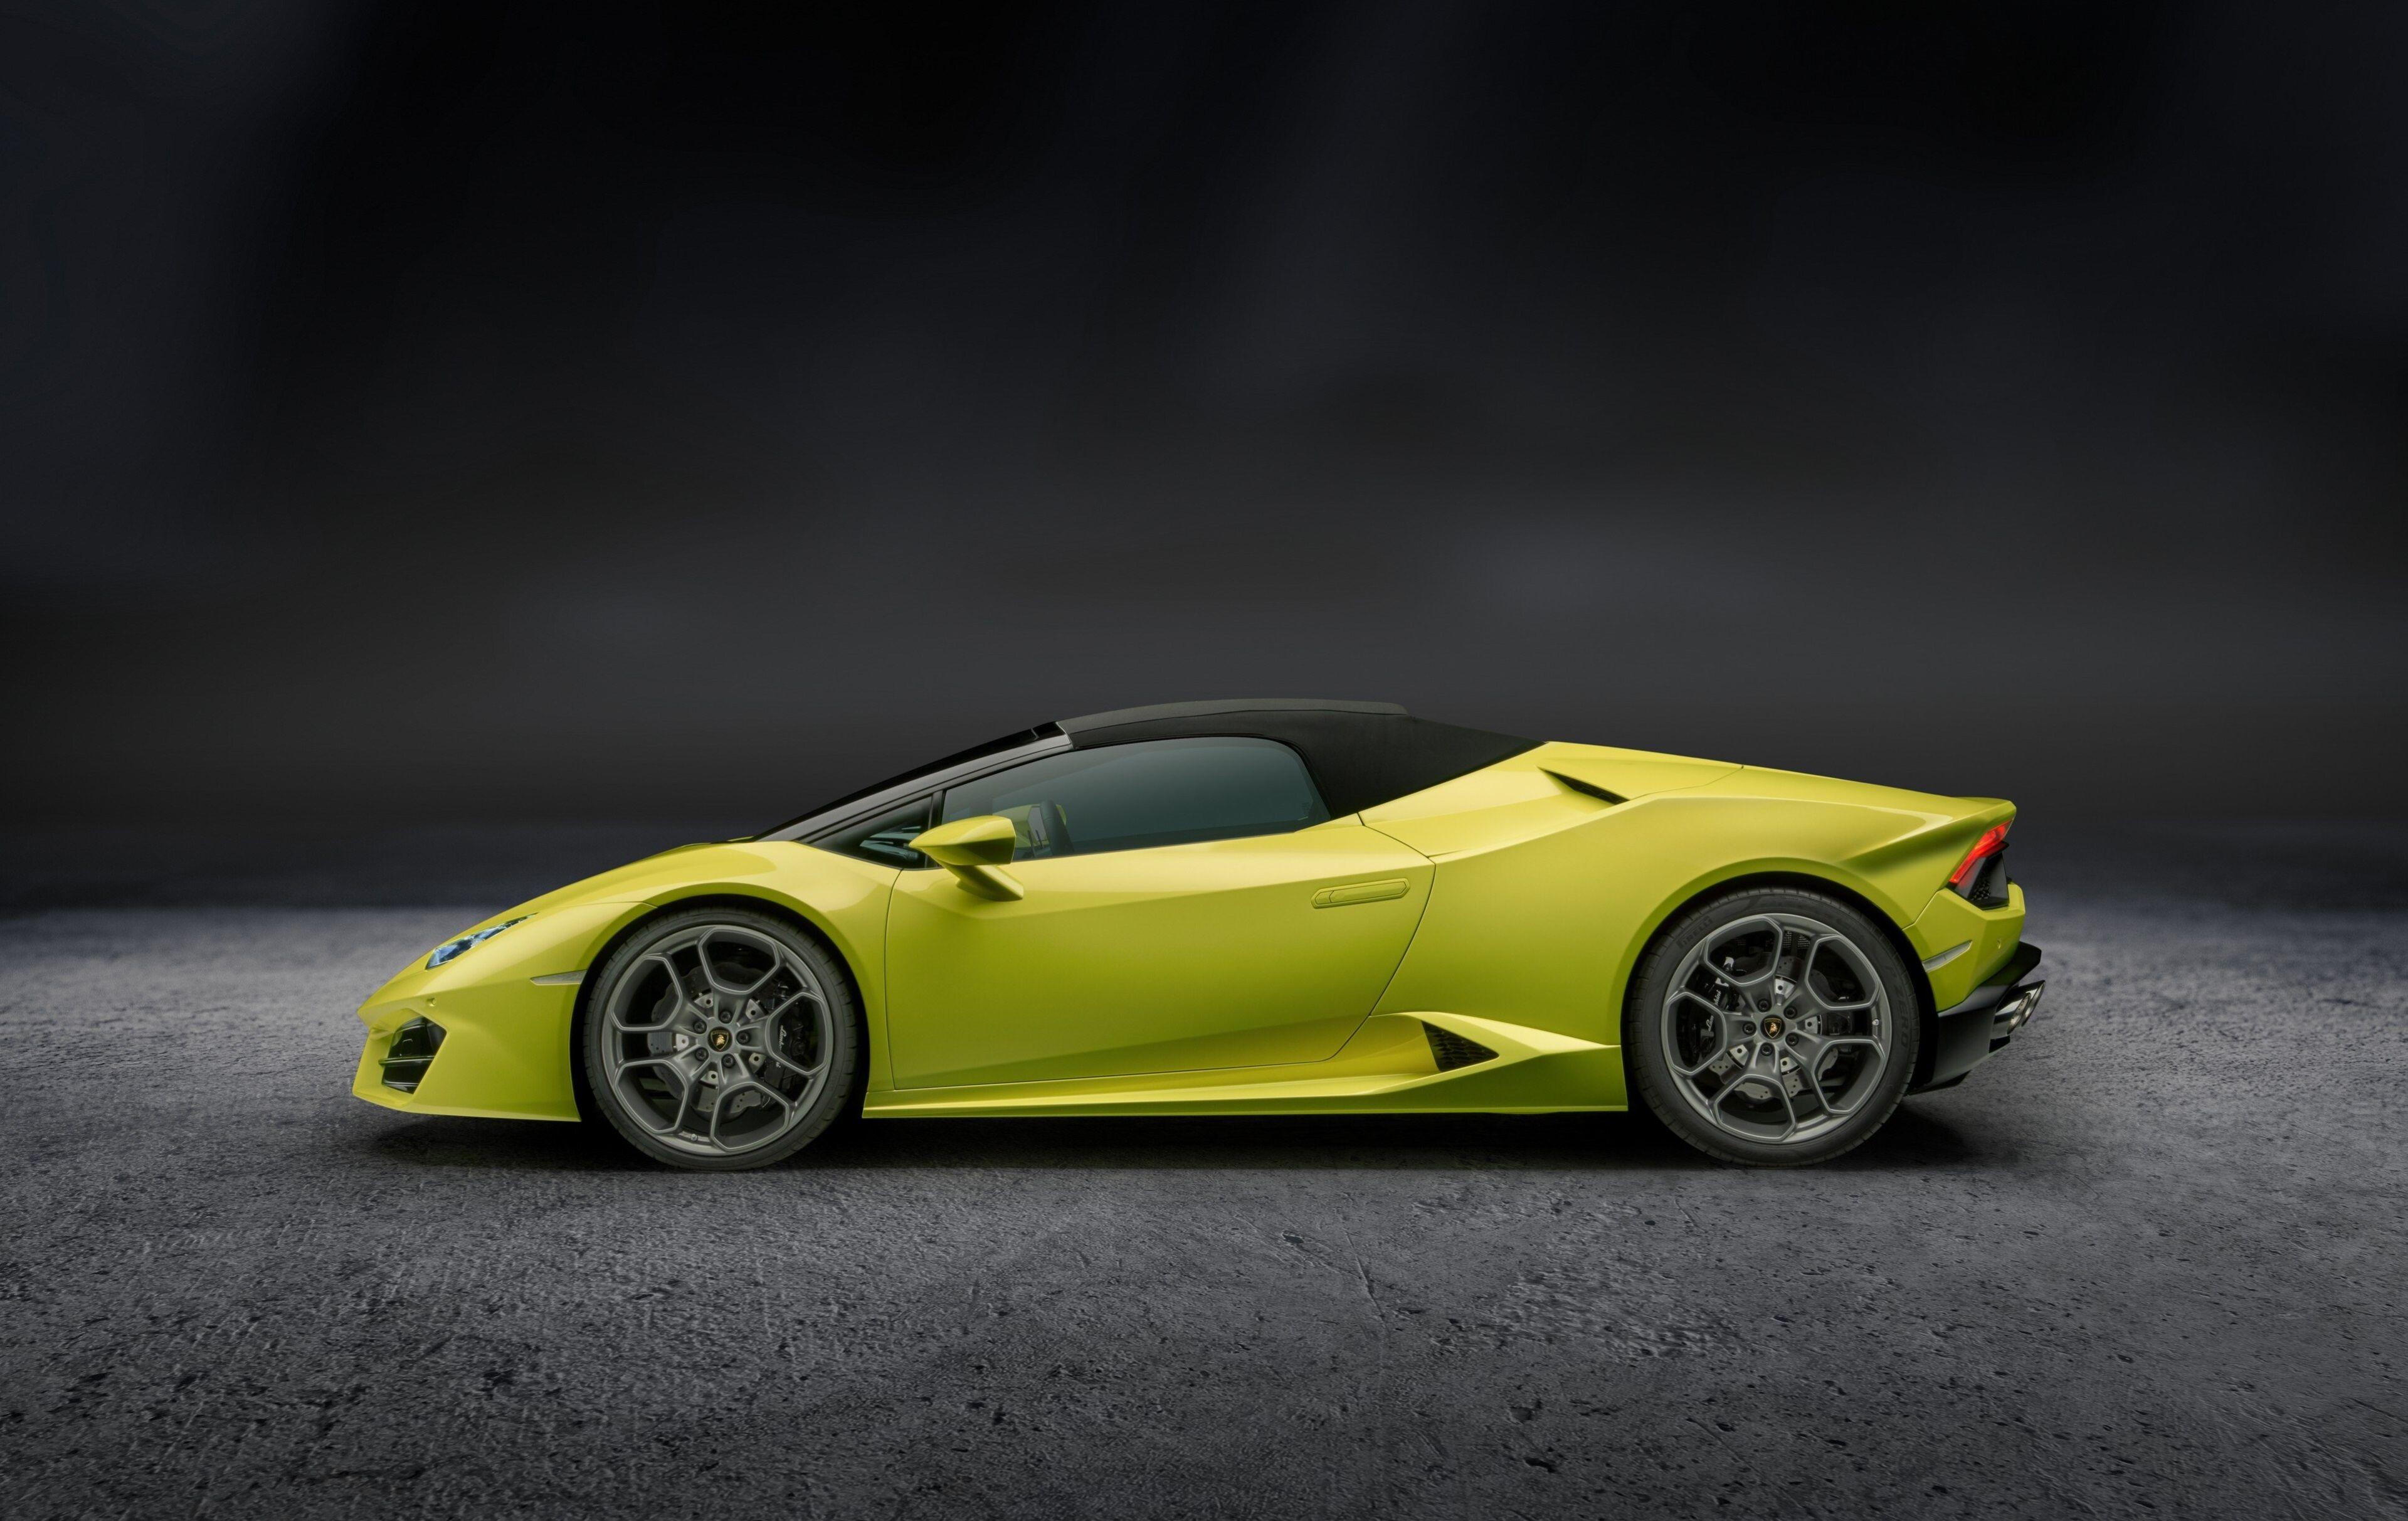 3840x2425 Lamborghini Huracan Lp 580 4k Amazing Image Supercars Lamborghini Huracan Lamborghini